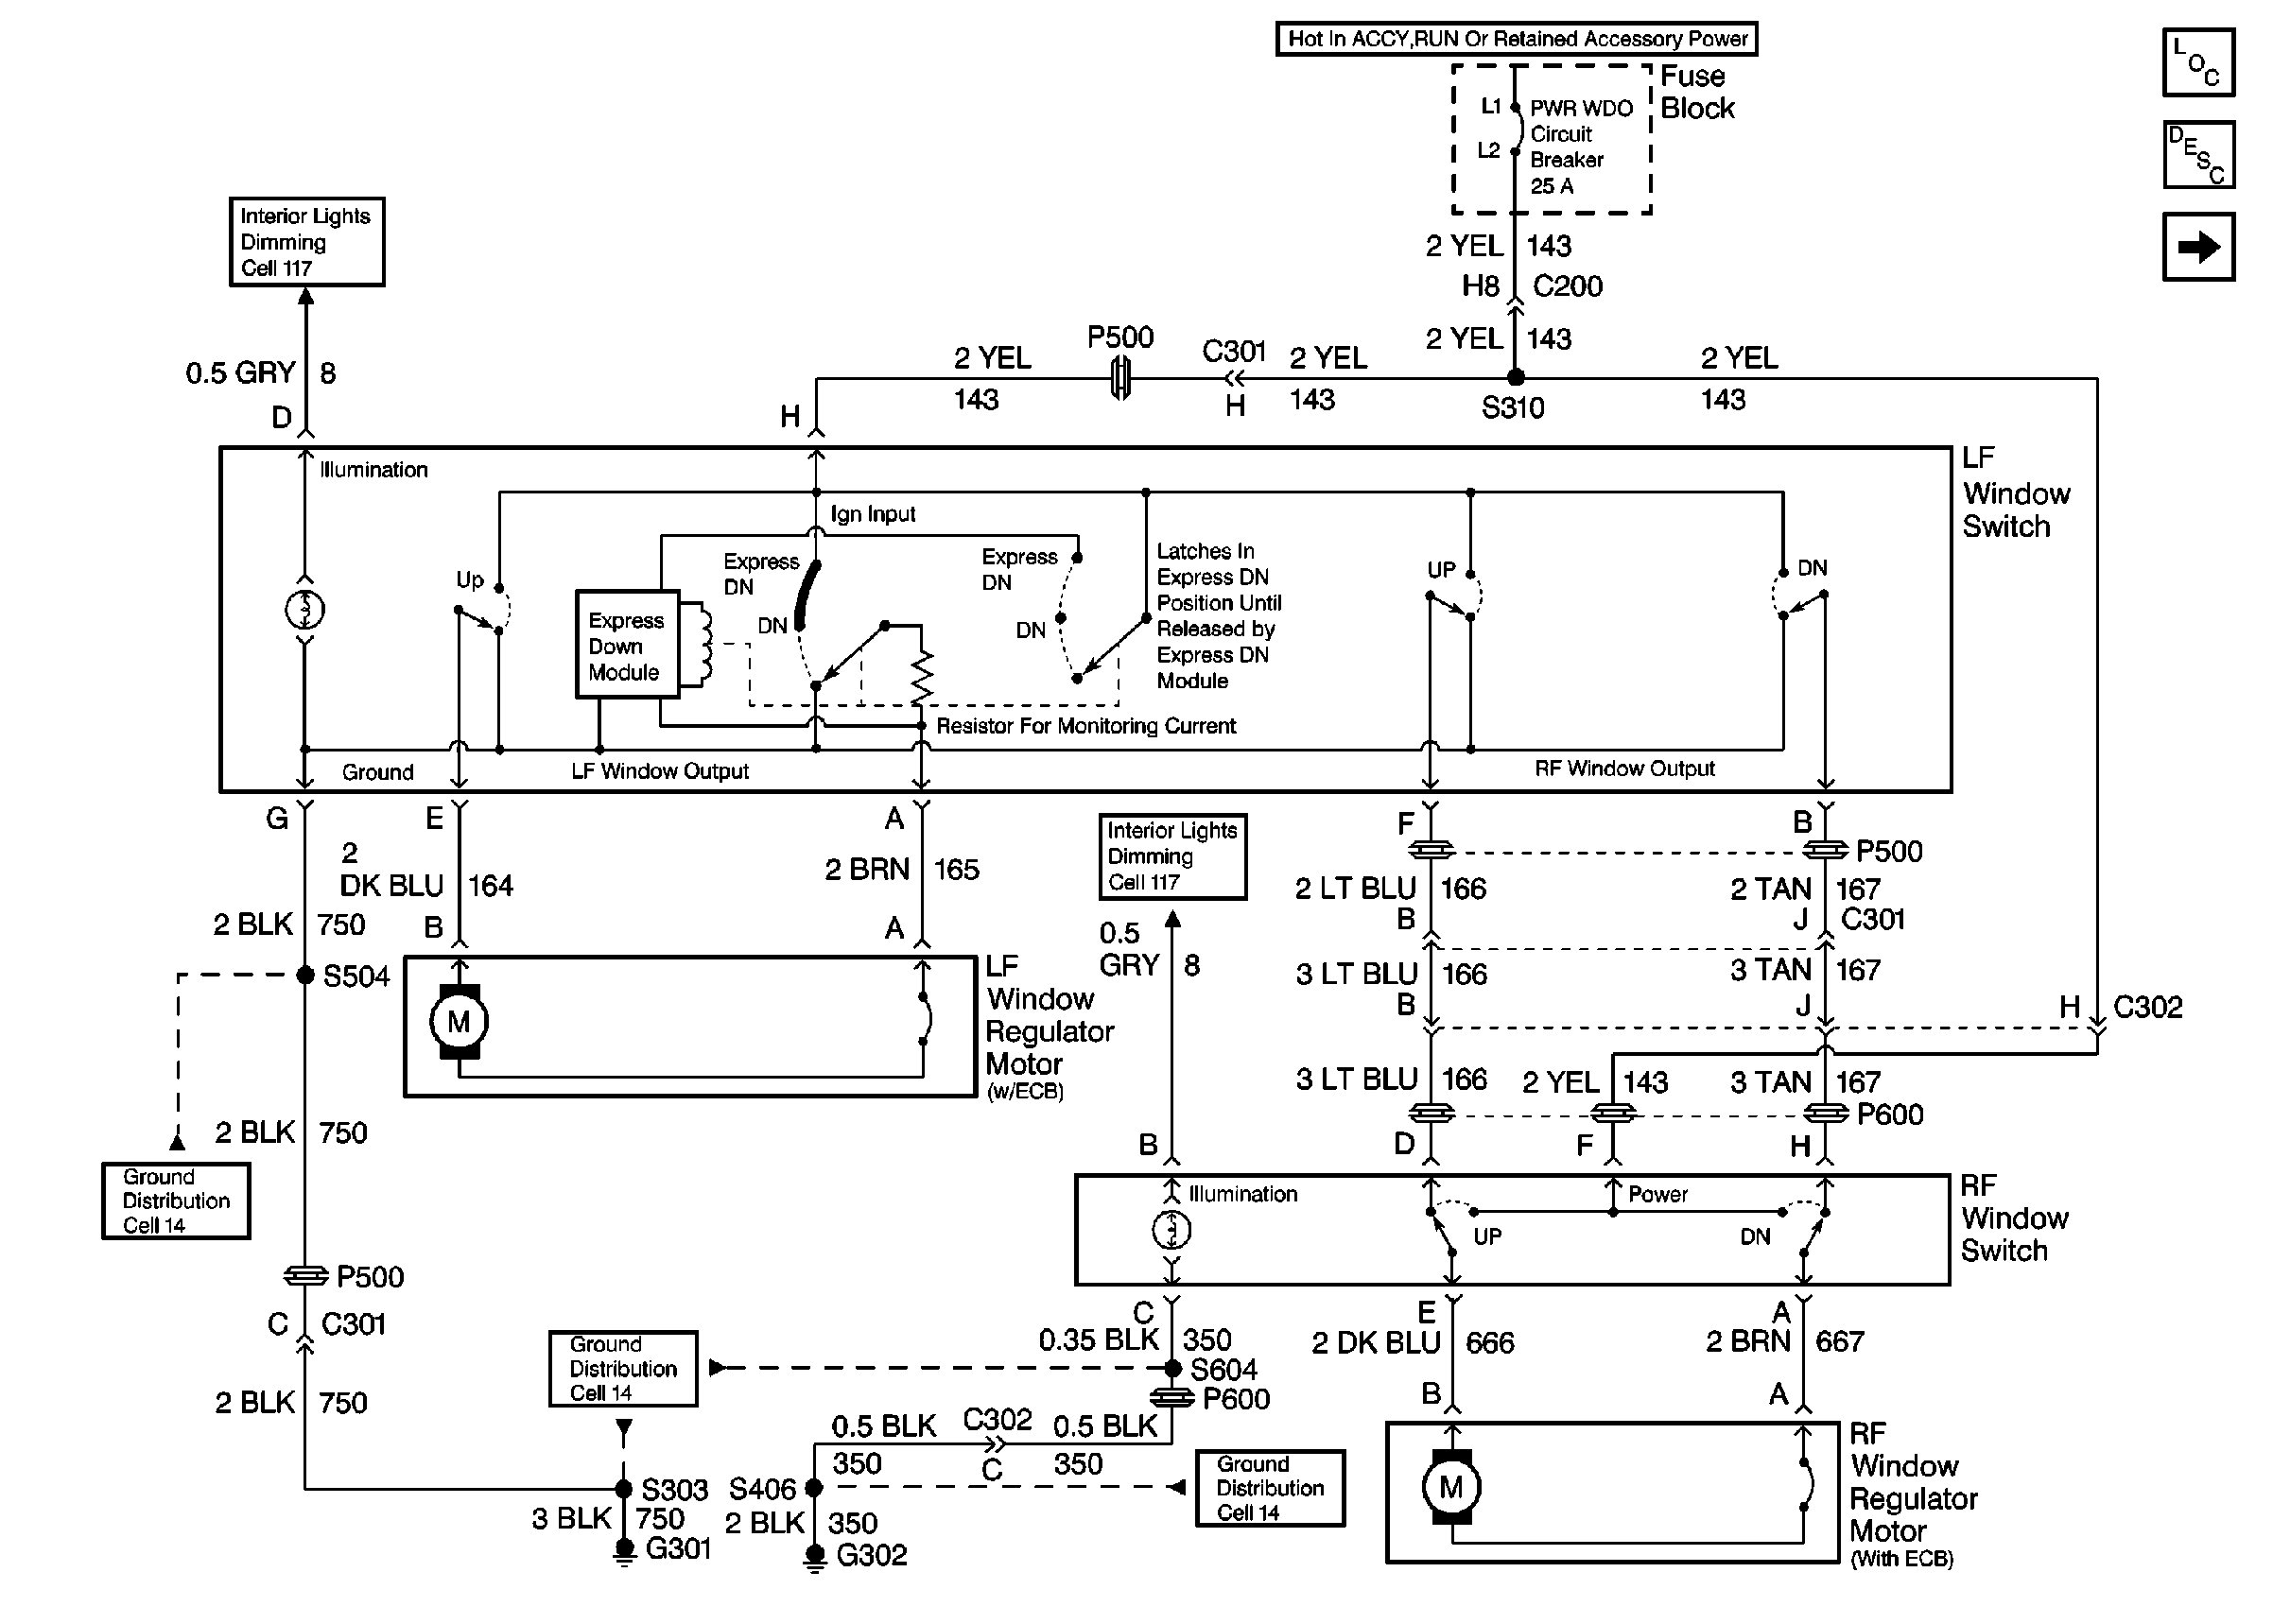 Outstanding 2012 Gm Power Window Wiring Blog Diagram Schema Wiring Cloud Gufailluminateatxorg